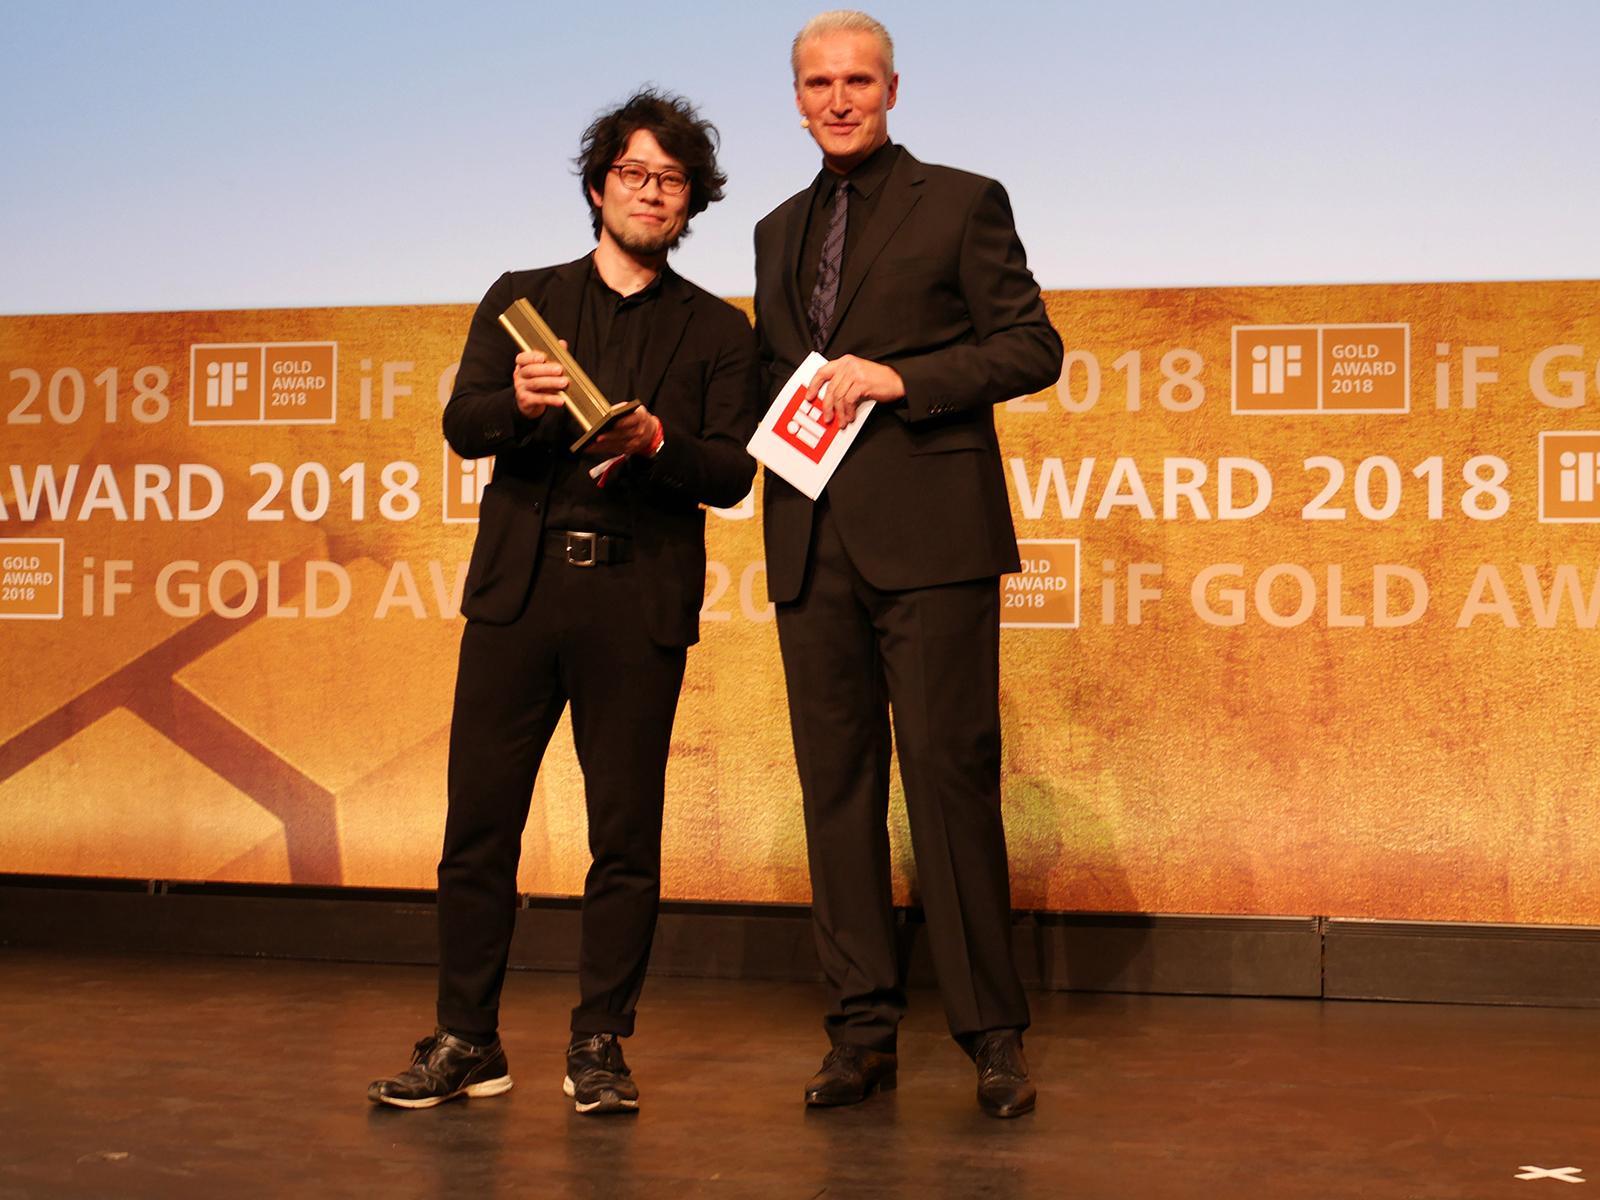 photo: panasonic won 2 golds at iF design award 2018